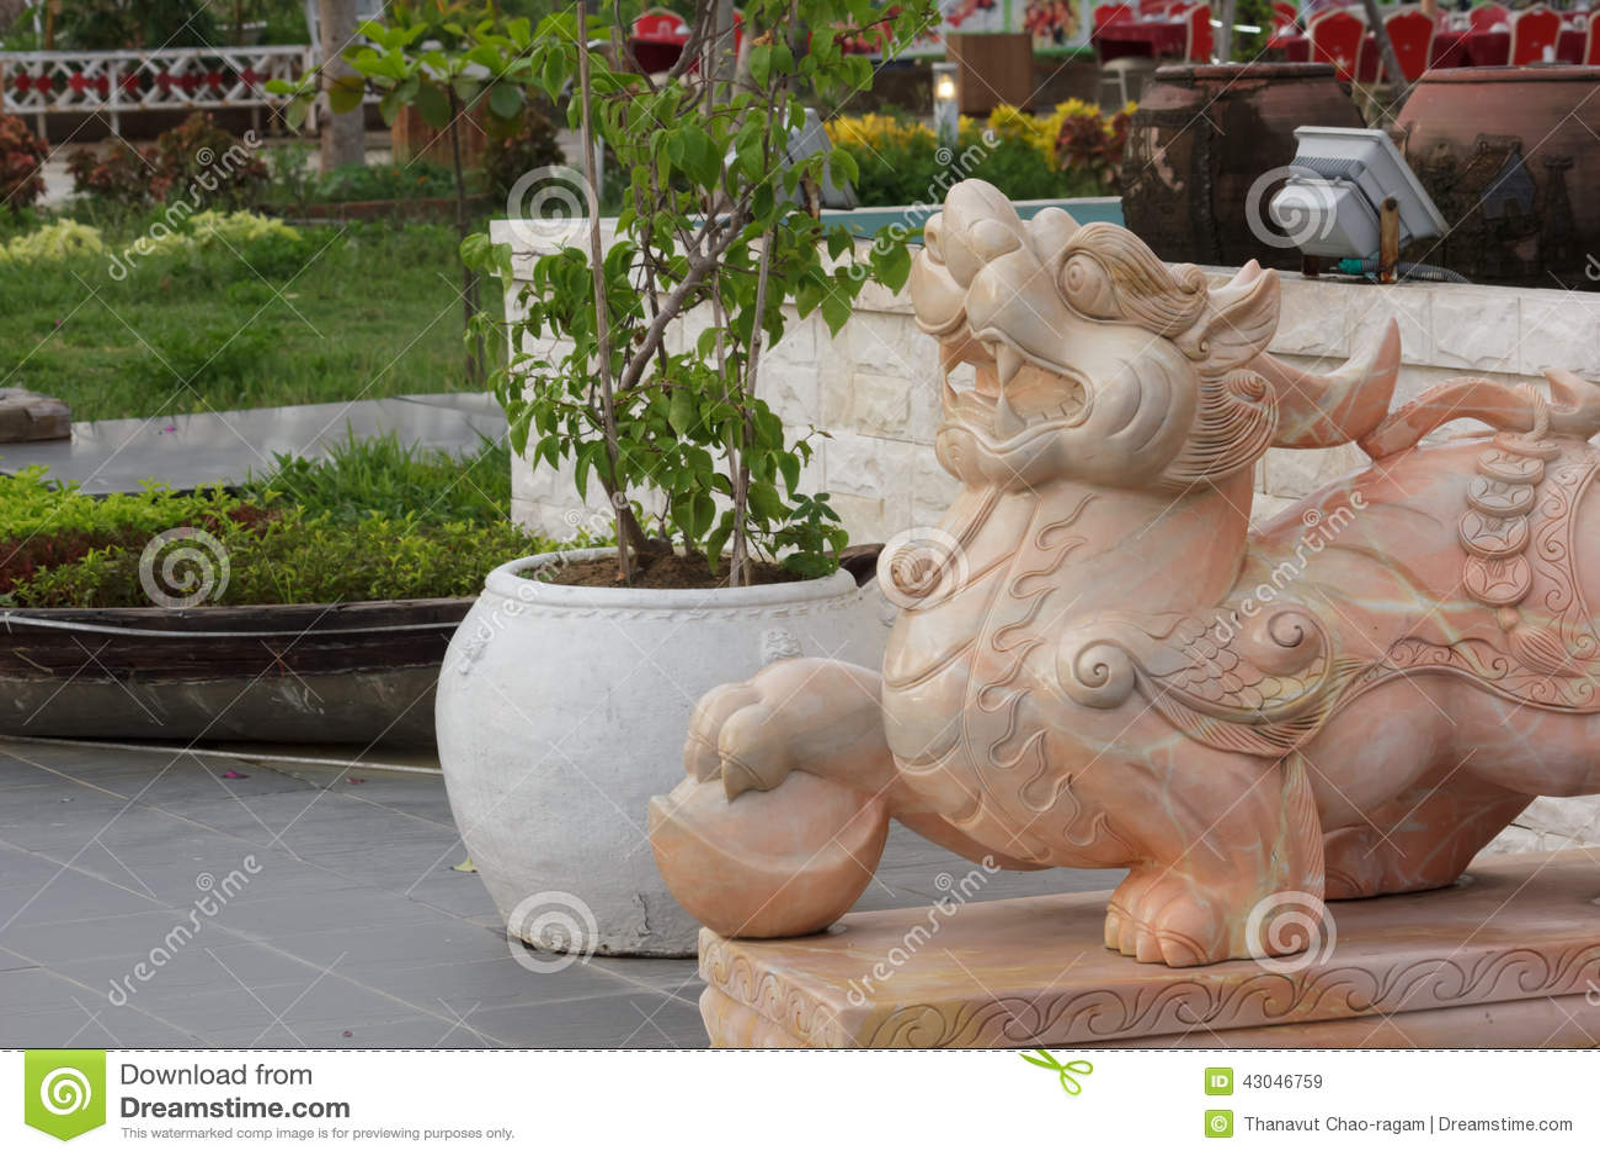 Lion Head Statue With Garden Stock Photo Cartoondealer